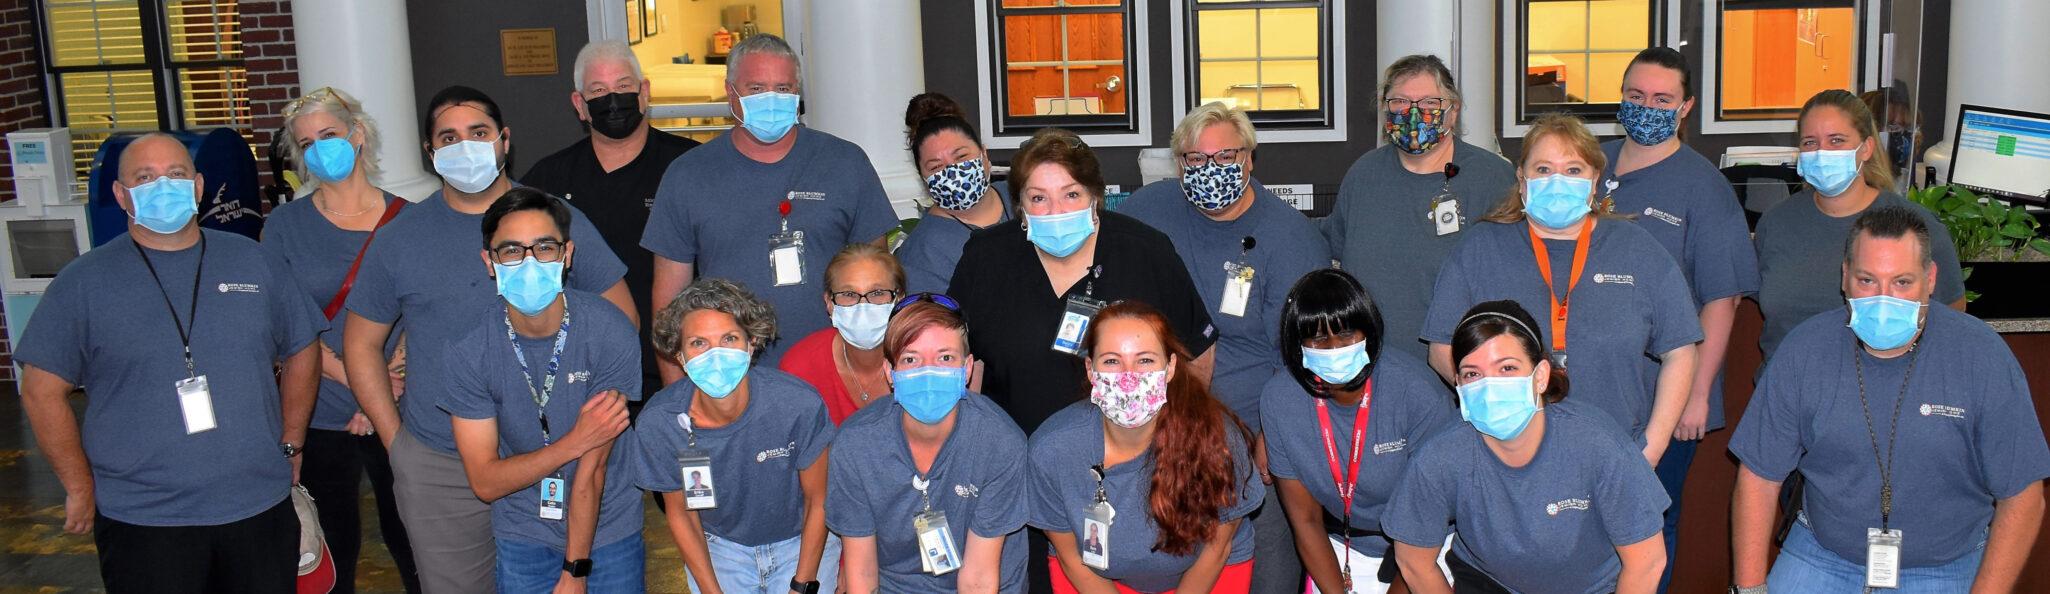 Skilled Nursing Facility in Omaha NE Rose Blumkin